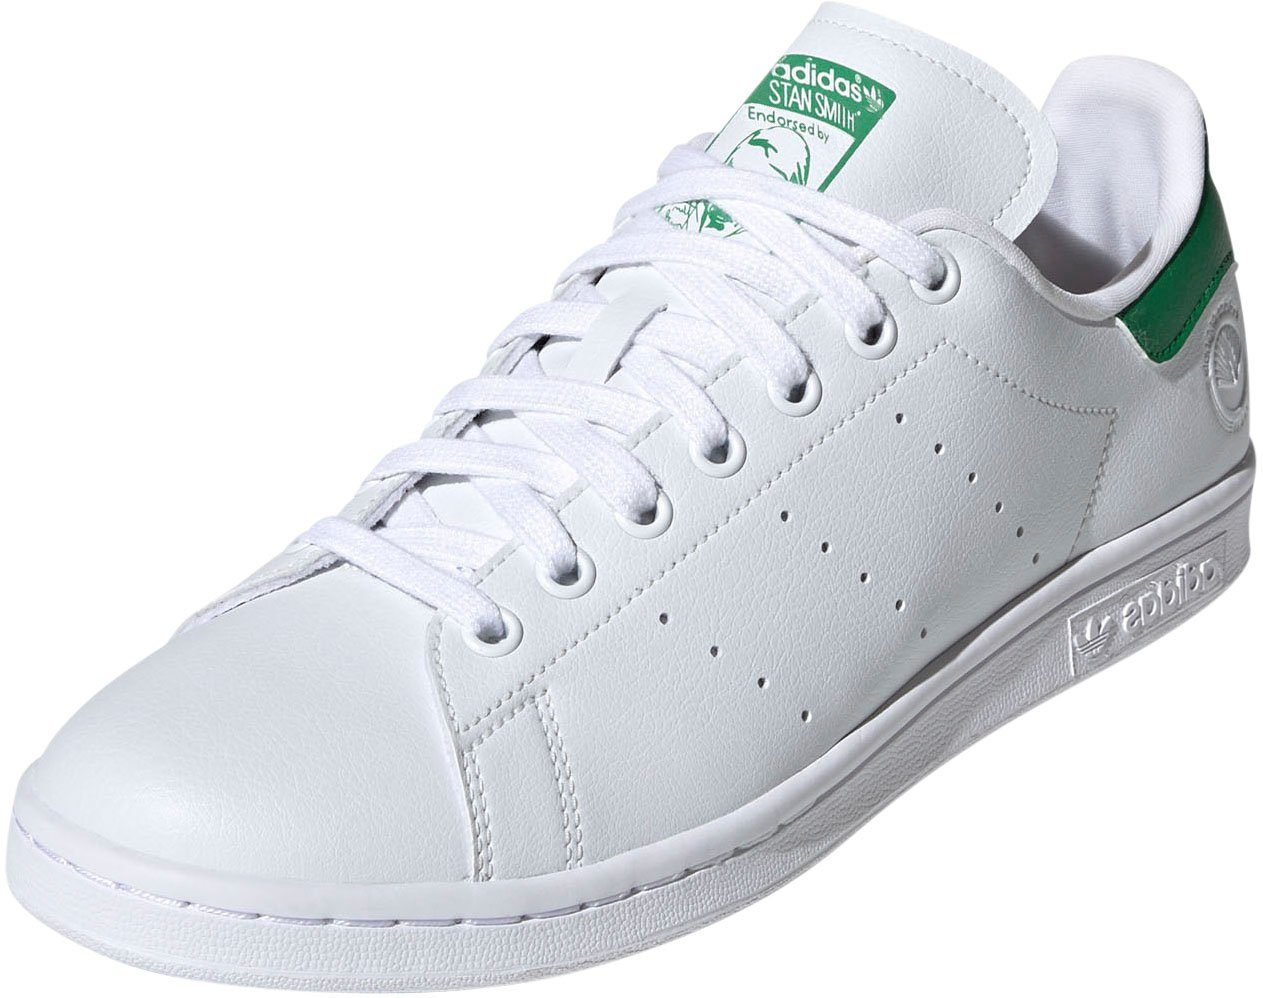 Adidas '' Stan Smith'' Trainings Jacke in weiß grün Größe M